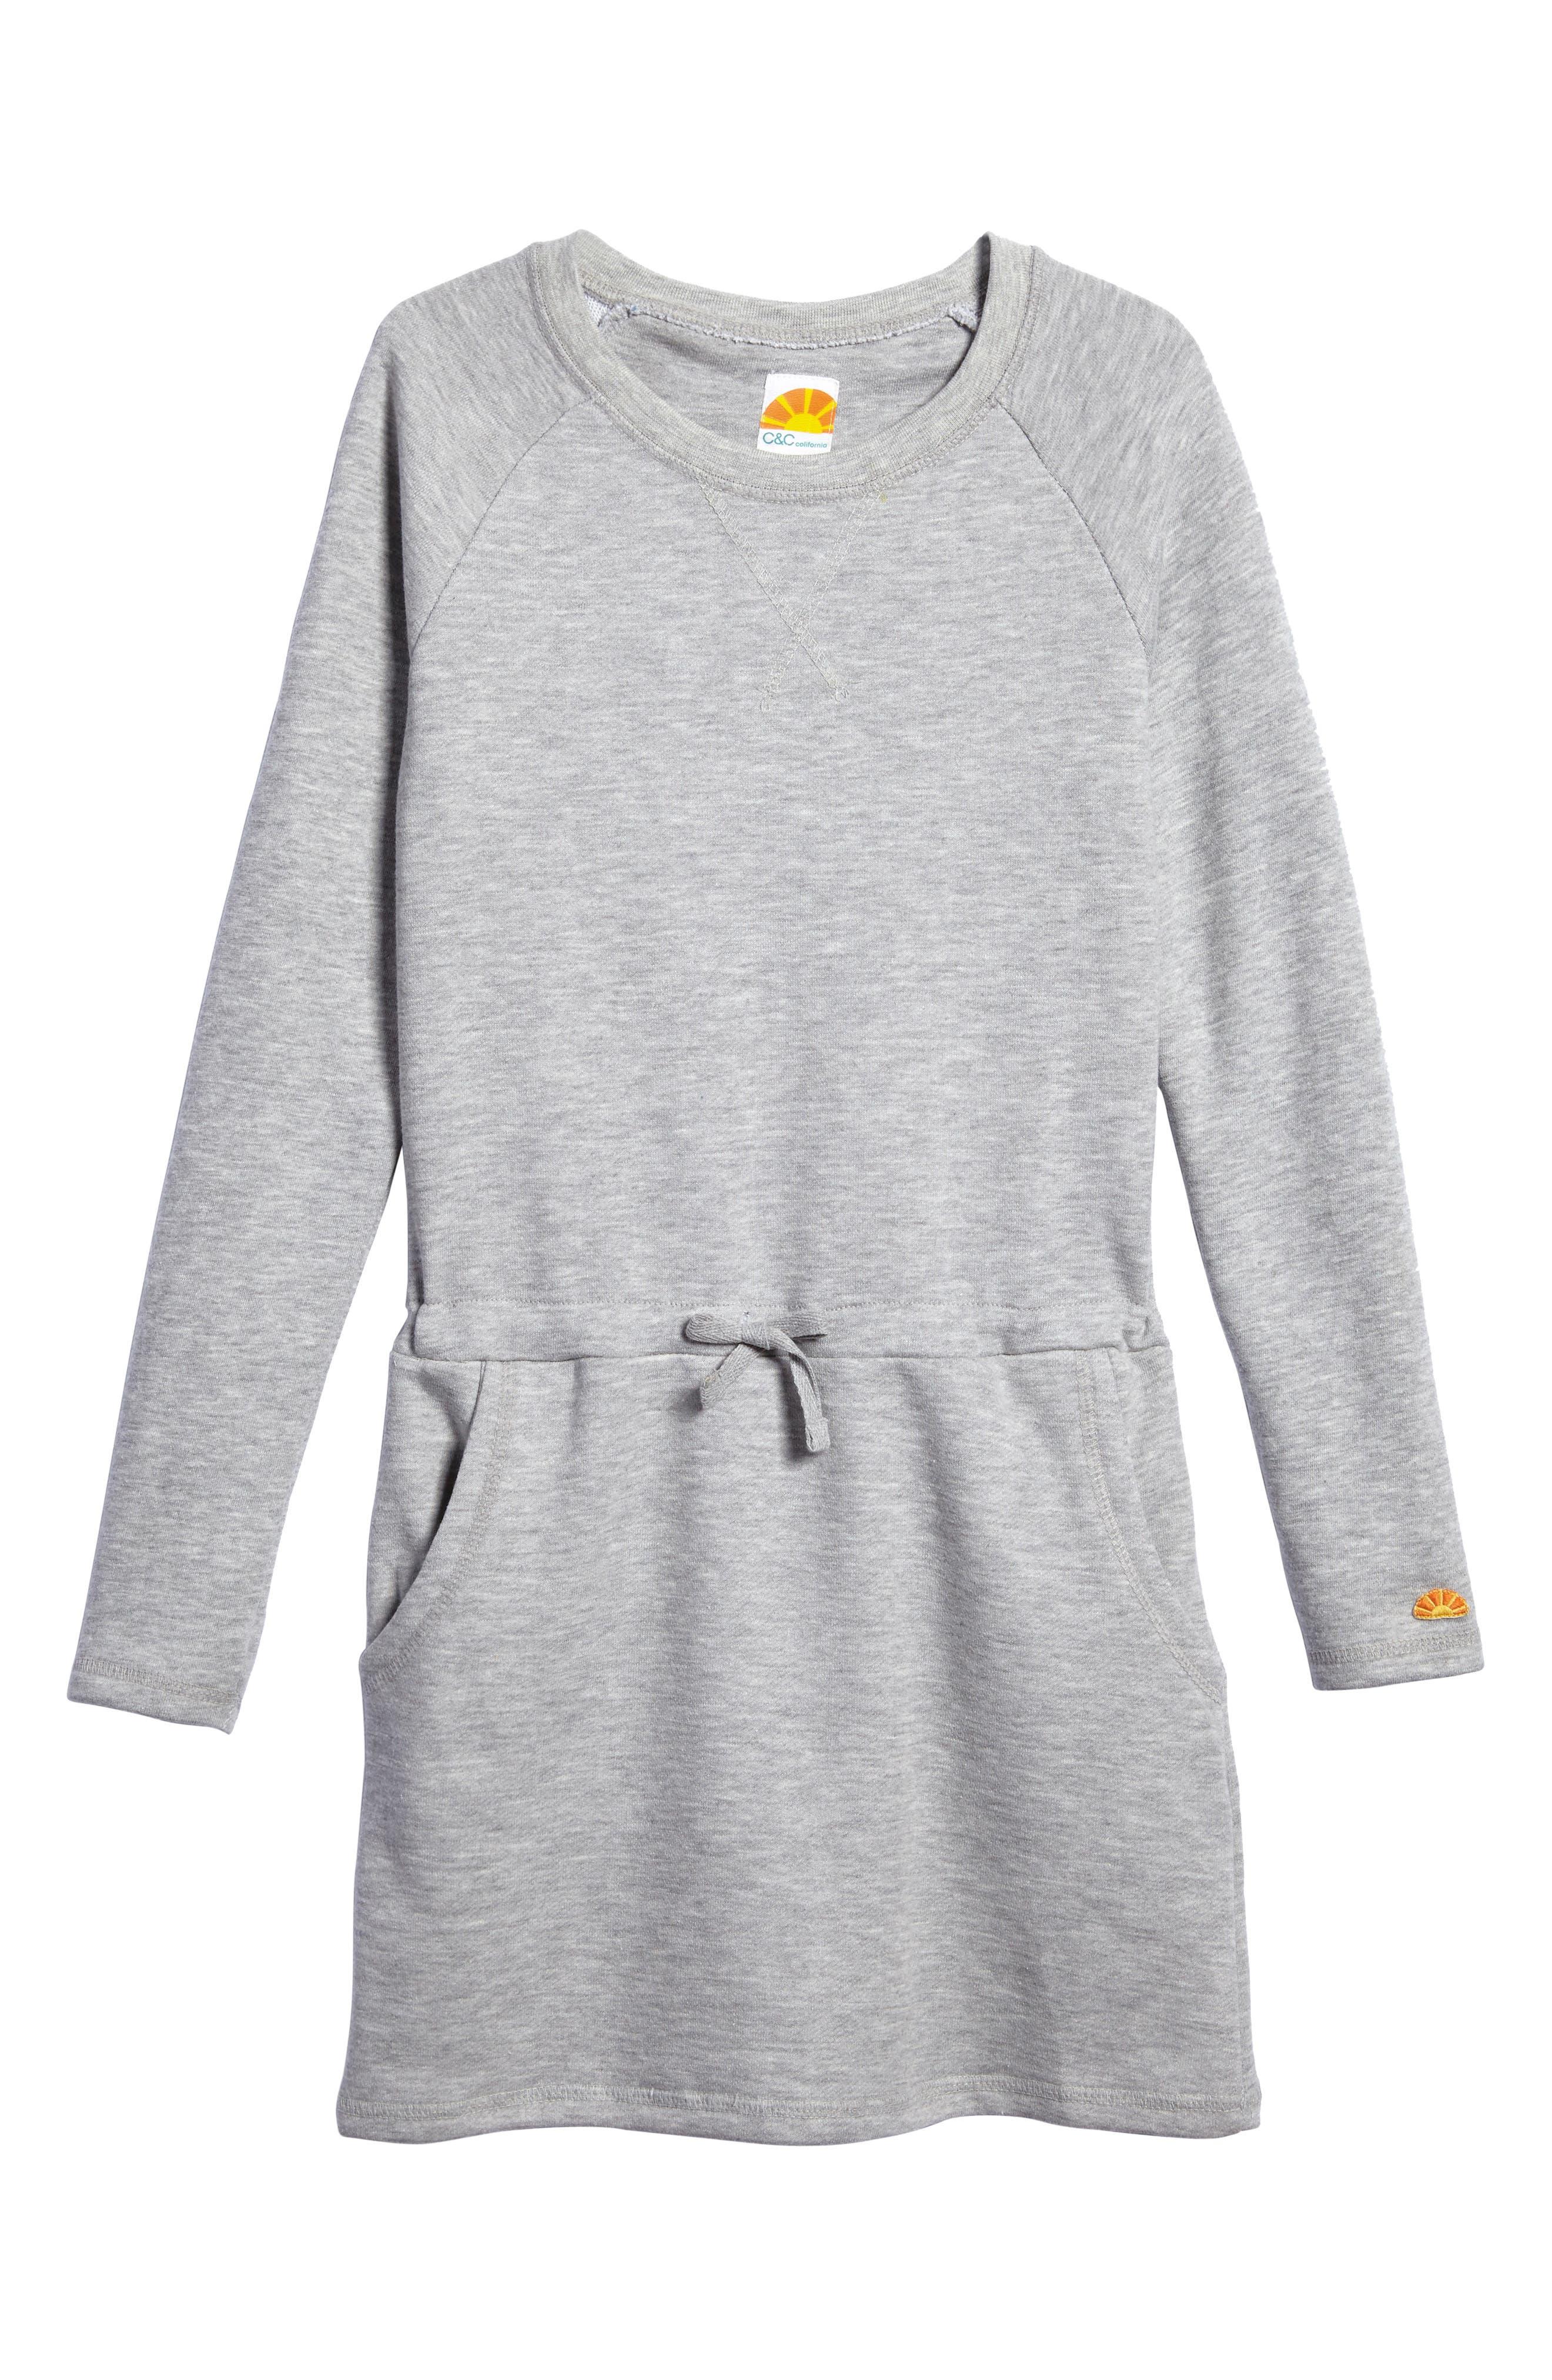 Main Image - C & C California Sweatshirt Dress (Big Girls)